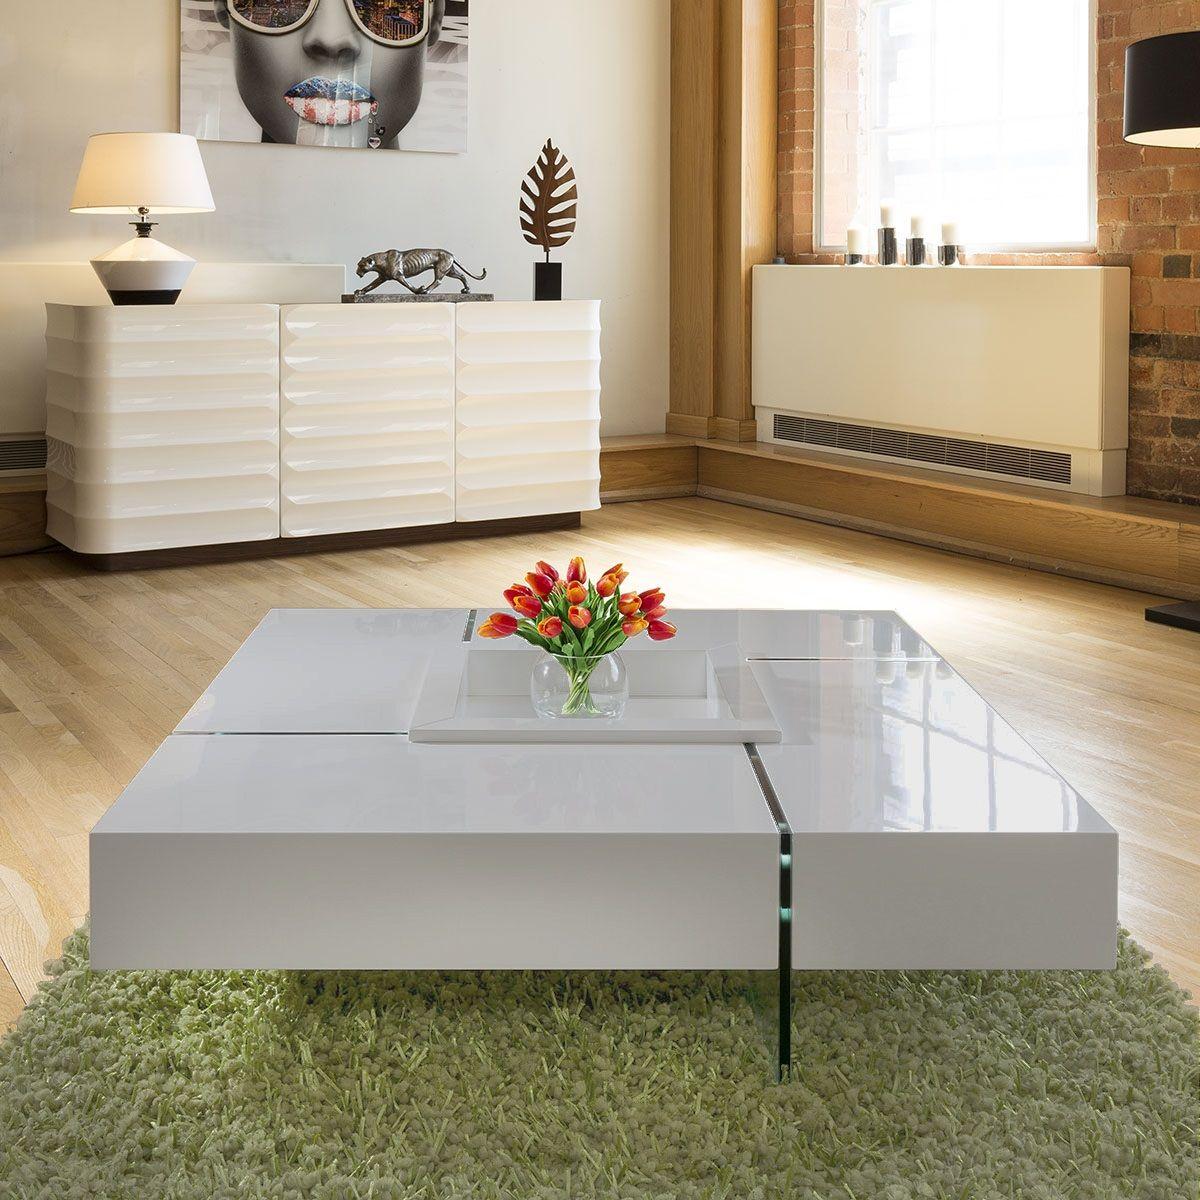 Modern Large Avorio Grey Gloss Coffee Table 1194 Mm Square Glass Legs Coffee Table Square White Gloss Coffee Table Coffee Table [ 1200 x 1200 Pixel ]